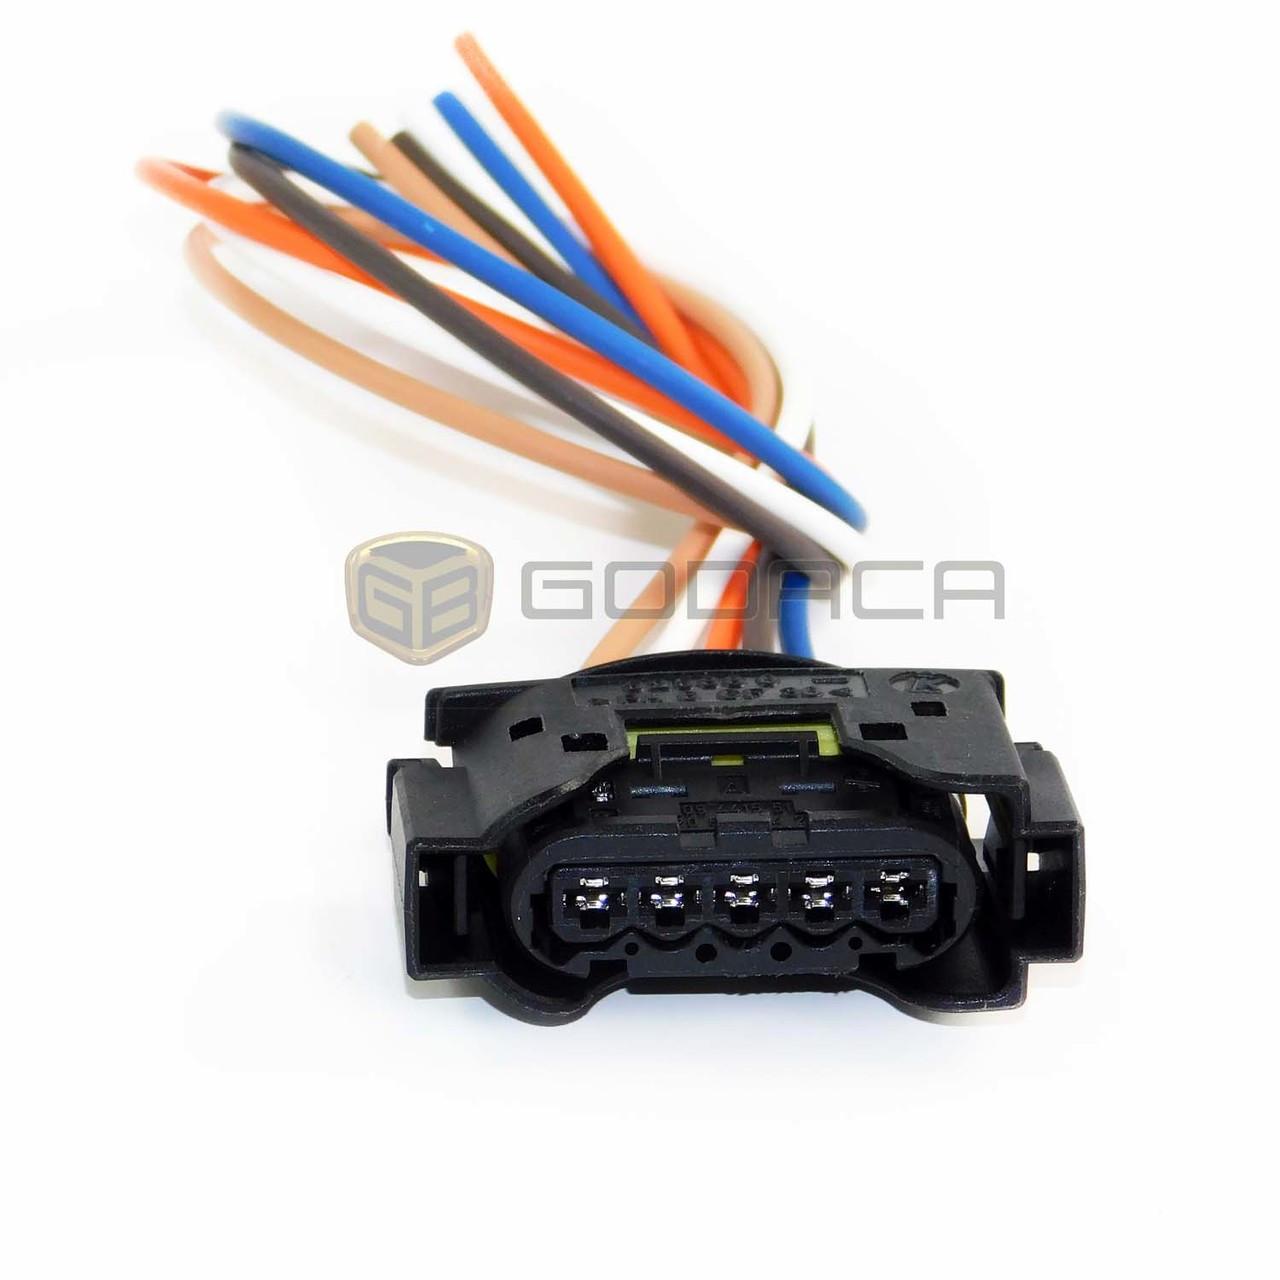 1x connector 5 way 5 pin for mercedes benz preheater a 2205450429 godaca llc  [ 1280 x 1280 Pixel ]